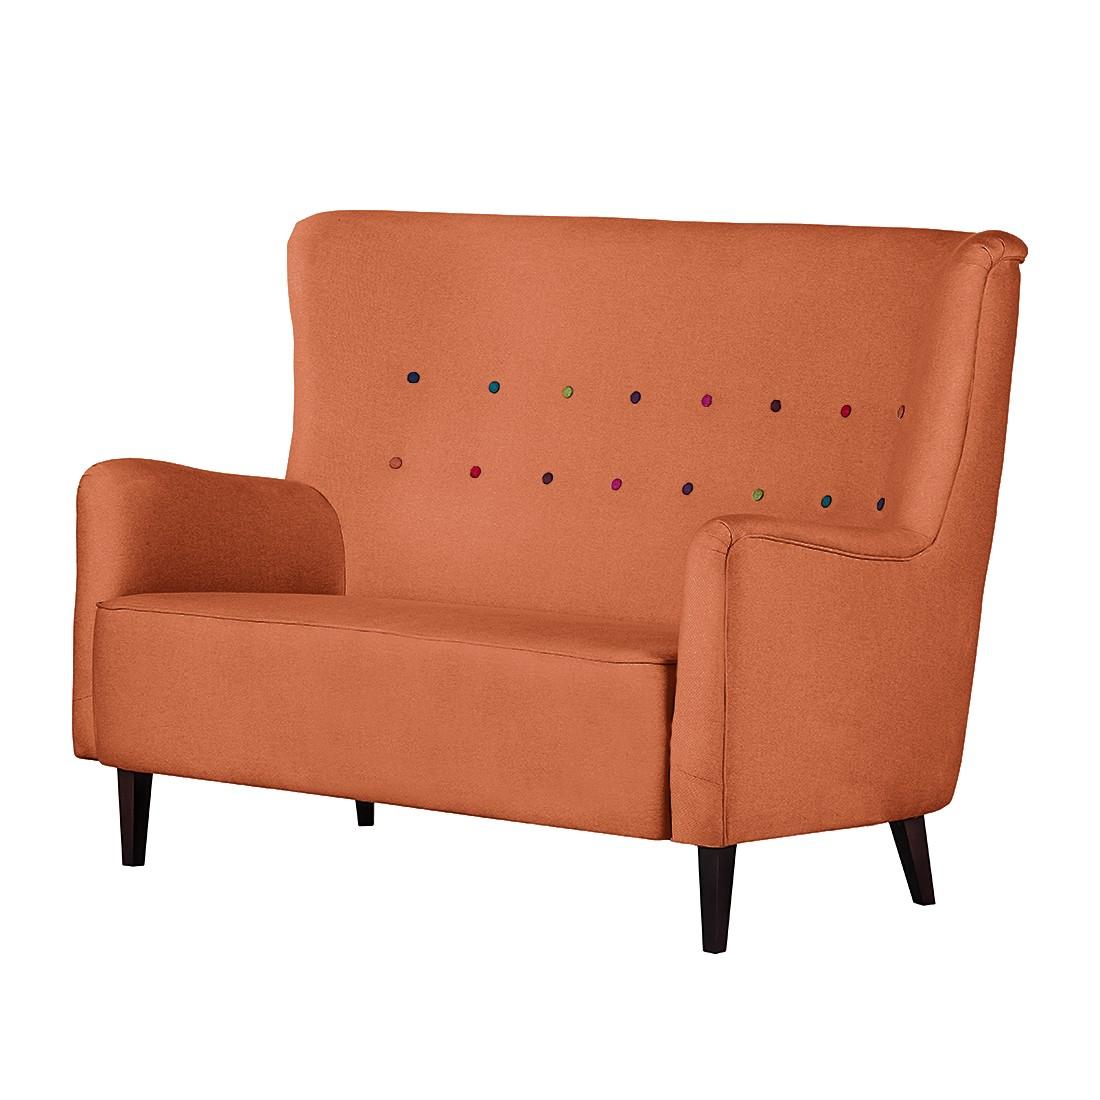 Sofa Josslyn (2-Sitzer) – Webstoff Orange, Mørteens jetzt kaufen